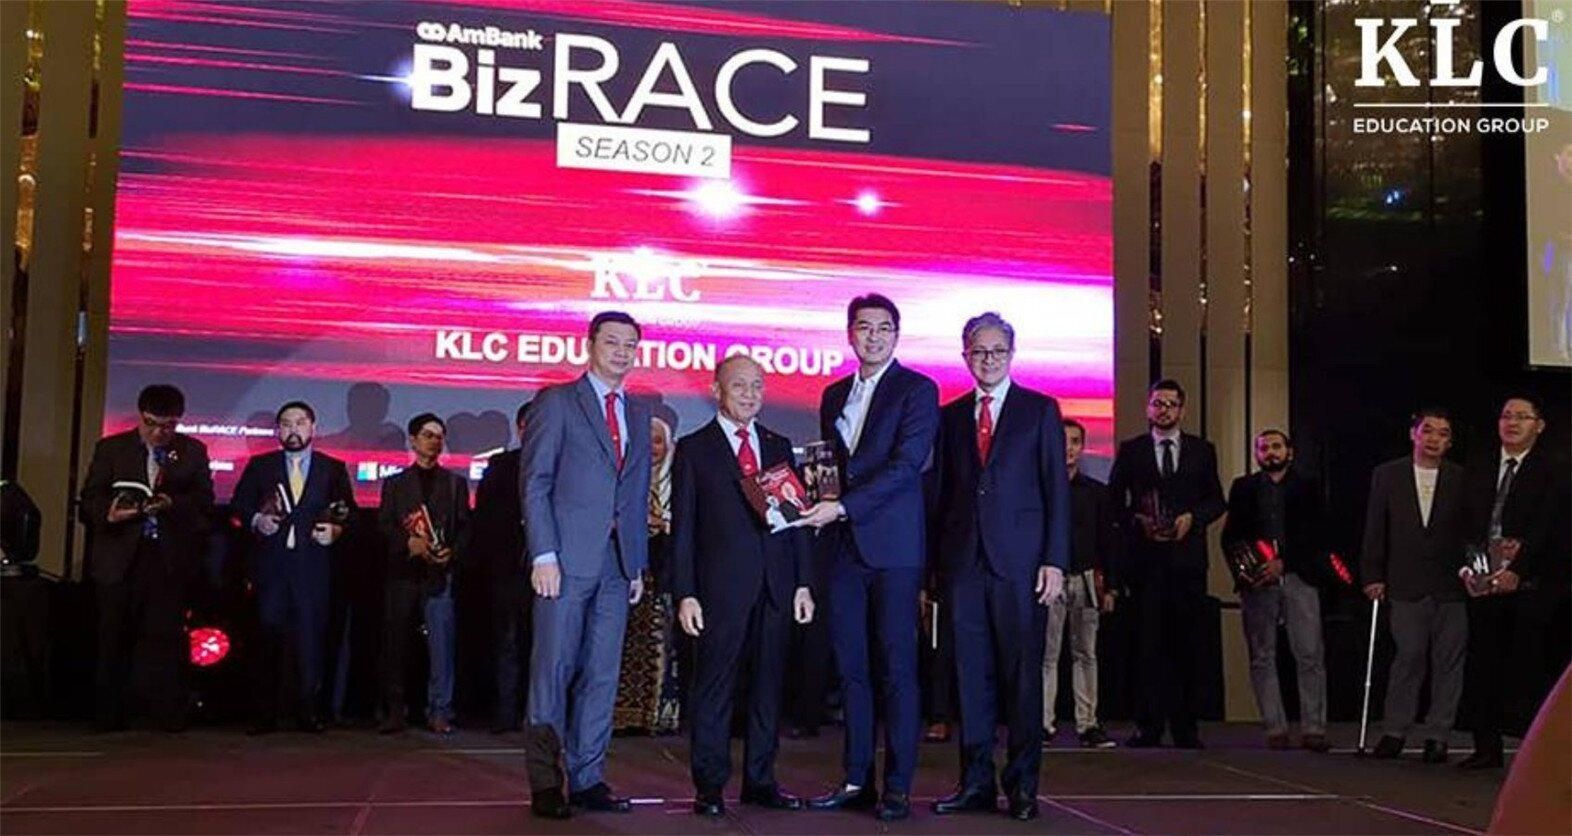 KLC 获得Top 30 Ambankbizrace